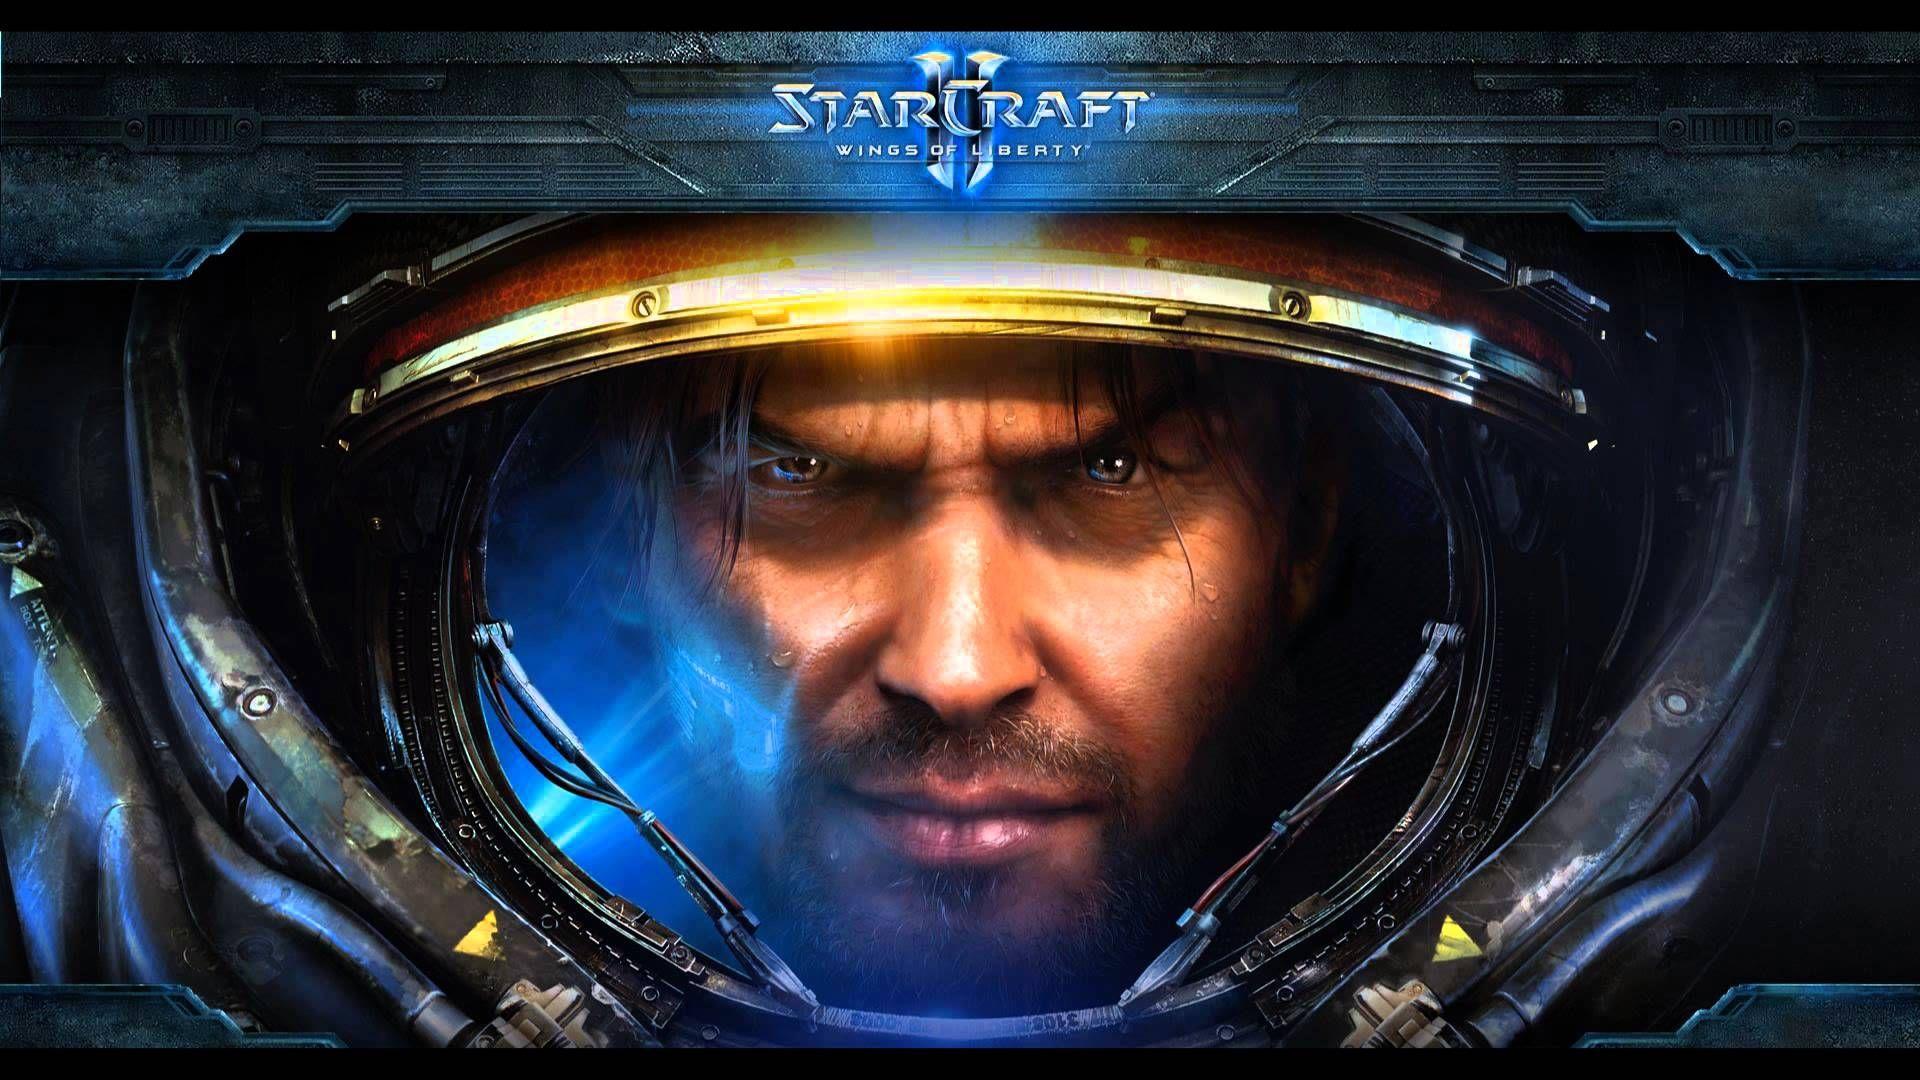 Starcraft 2 prešao na free to play model